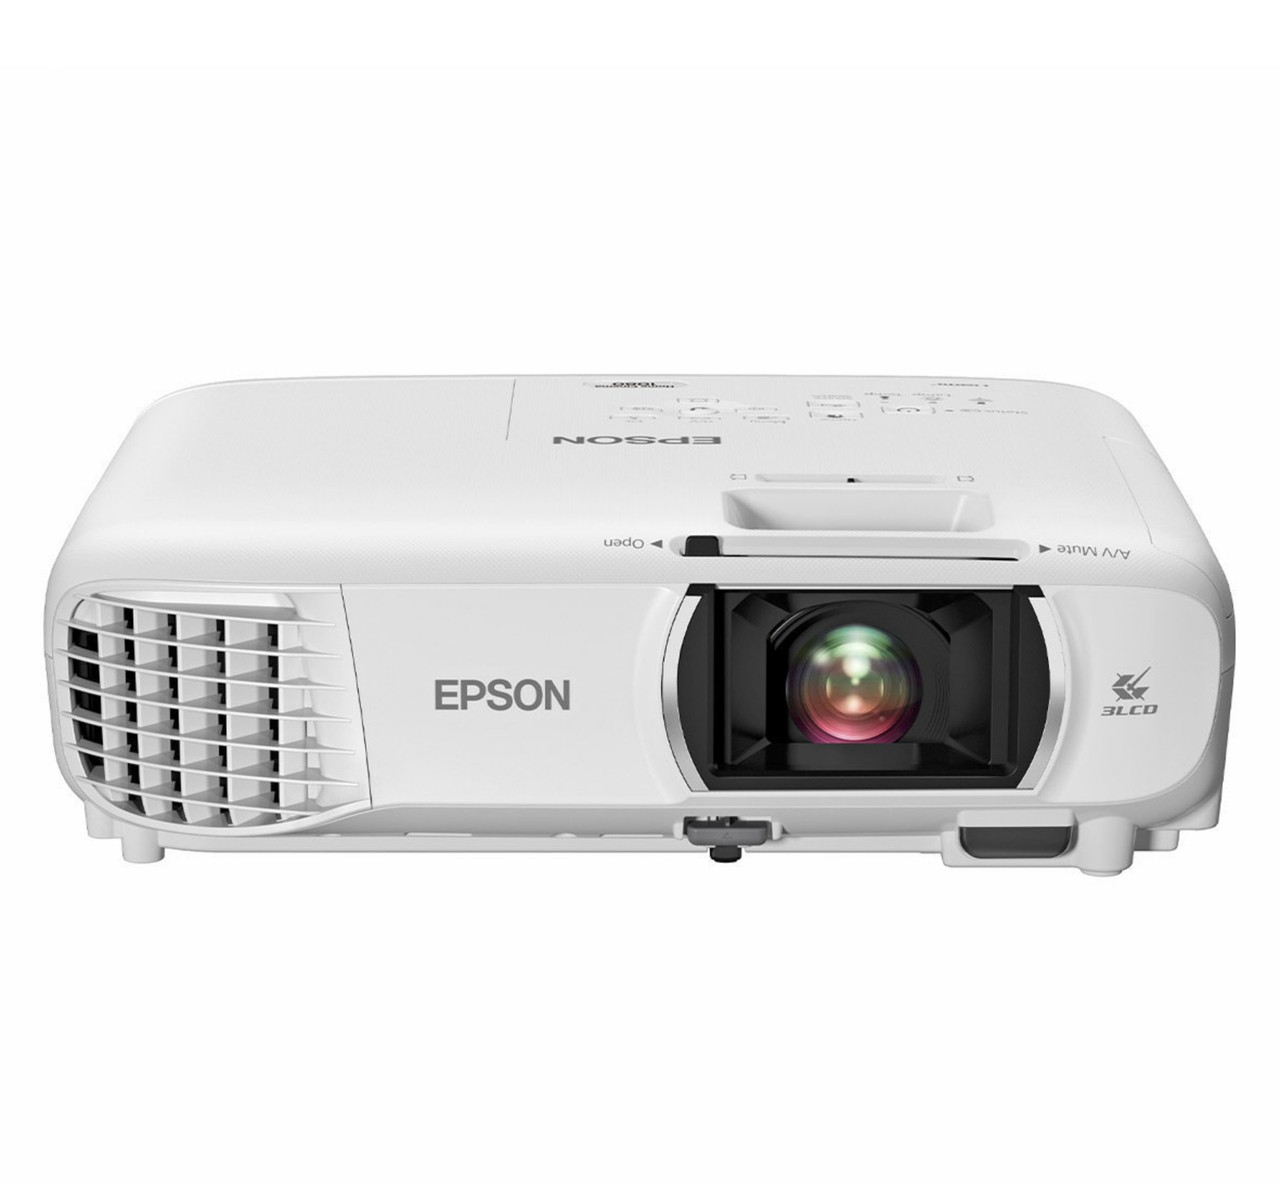 Projetor Epson Home Cinema 1080 - 3400 Lumen Full HD 3LCD 1080p Branco